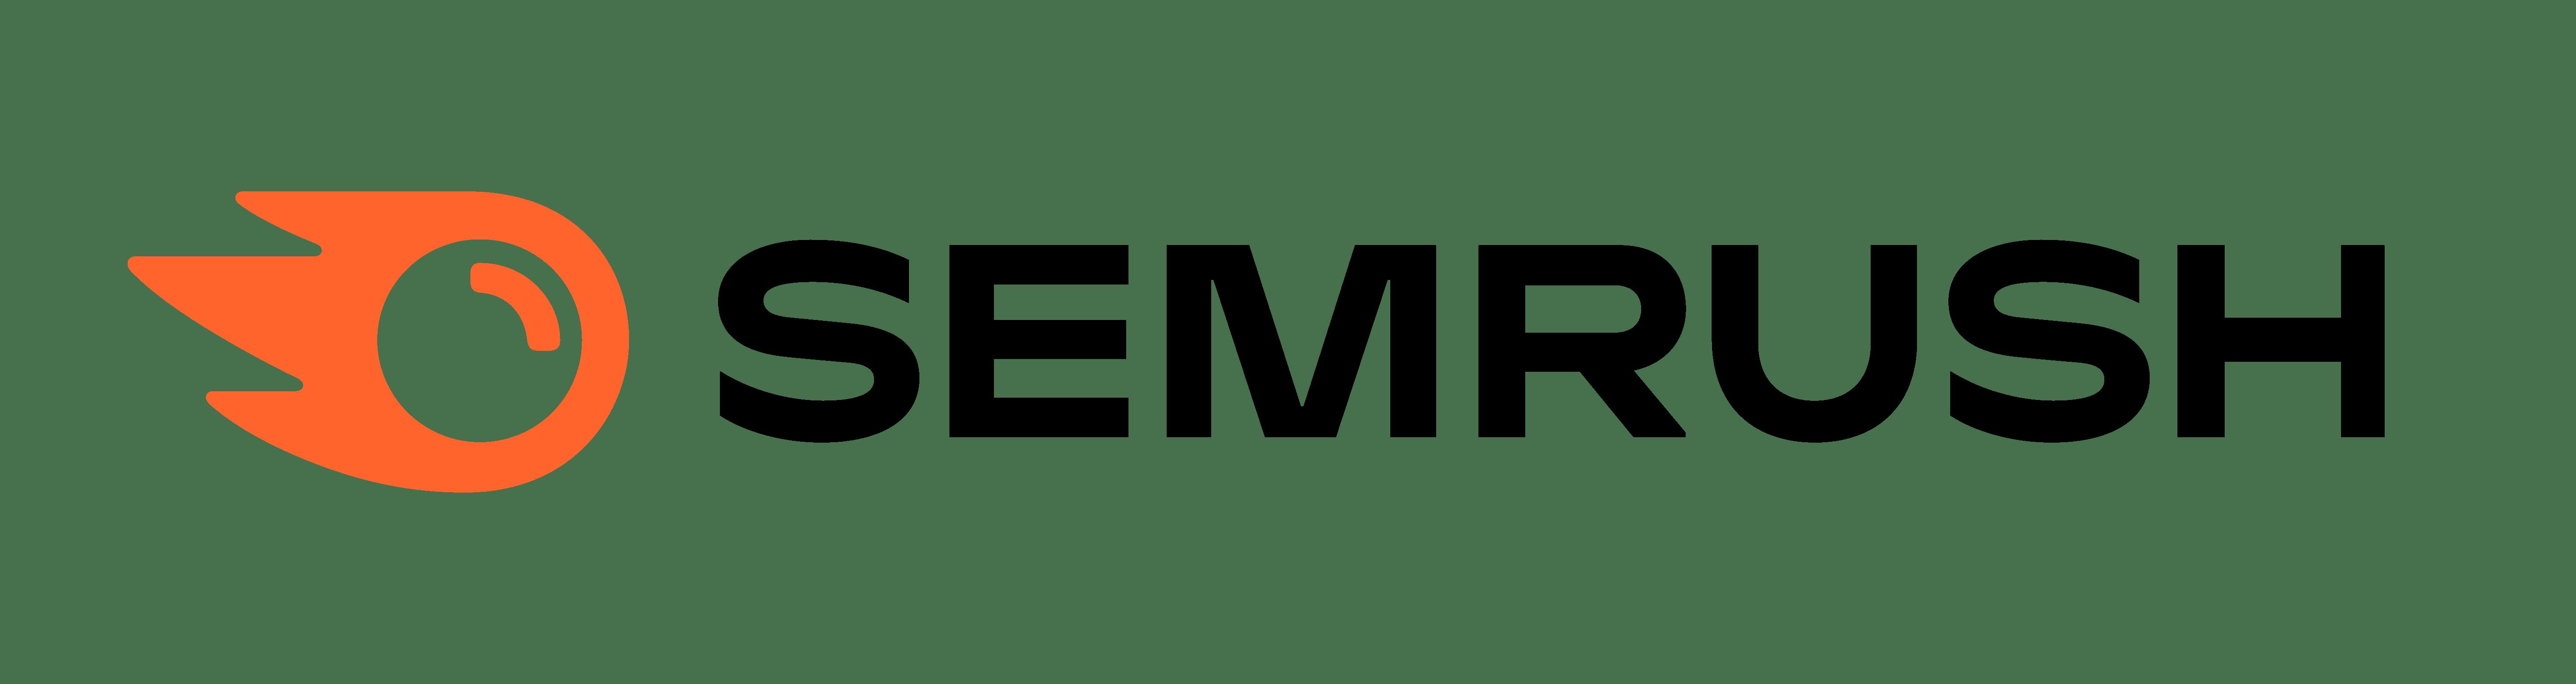 Semrush Pro - 14 Day Extended Trial